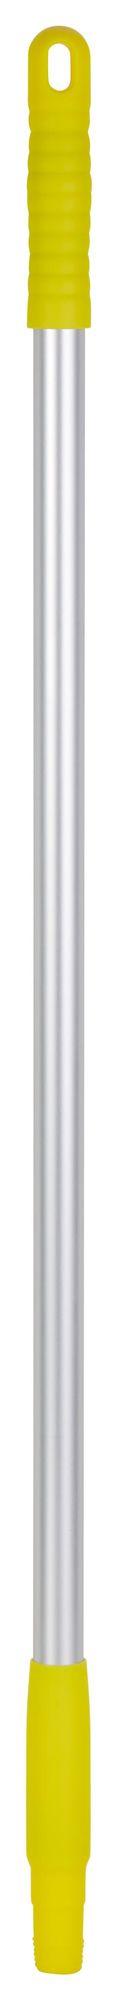 Vikan hygiëne steel 84cm geel -   29316